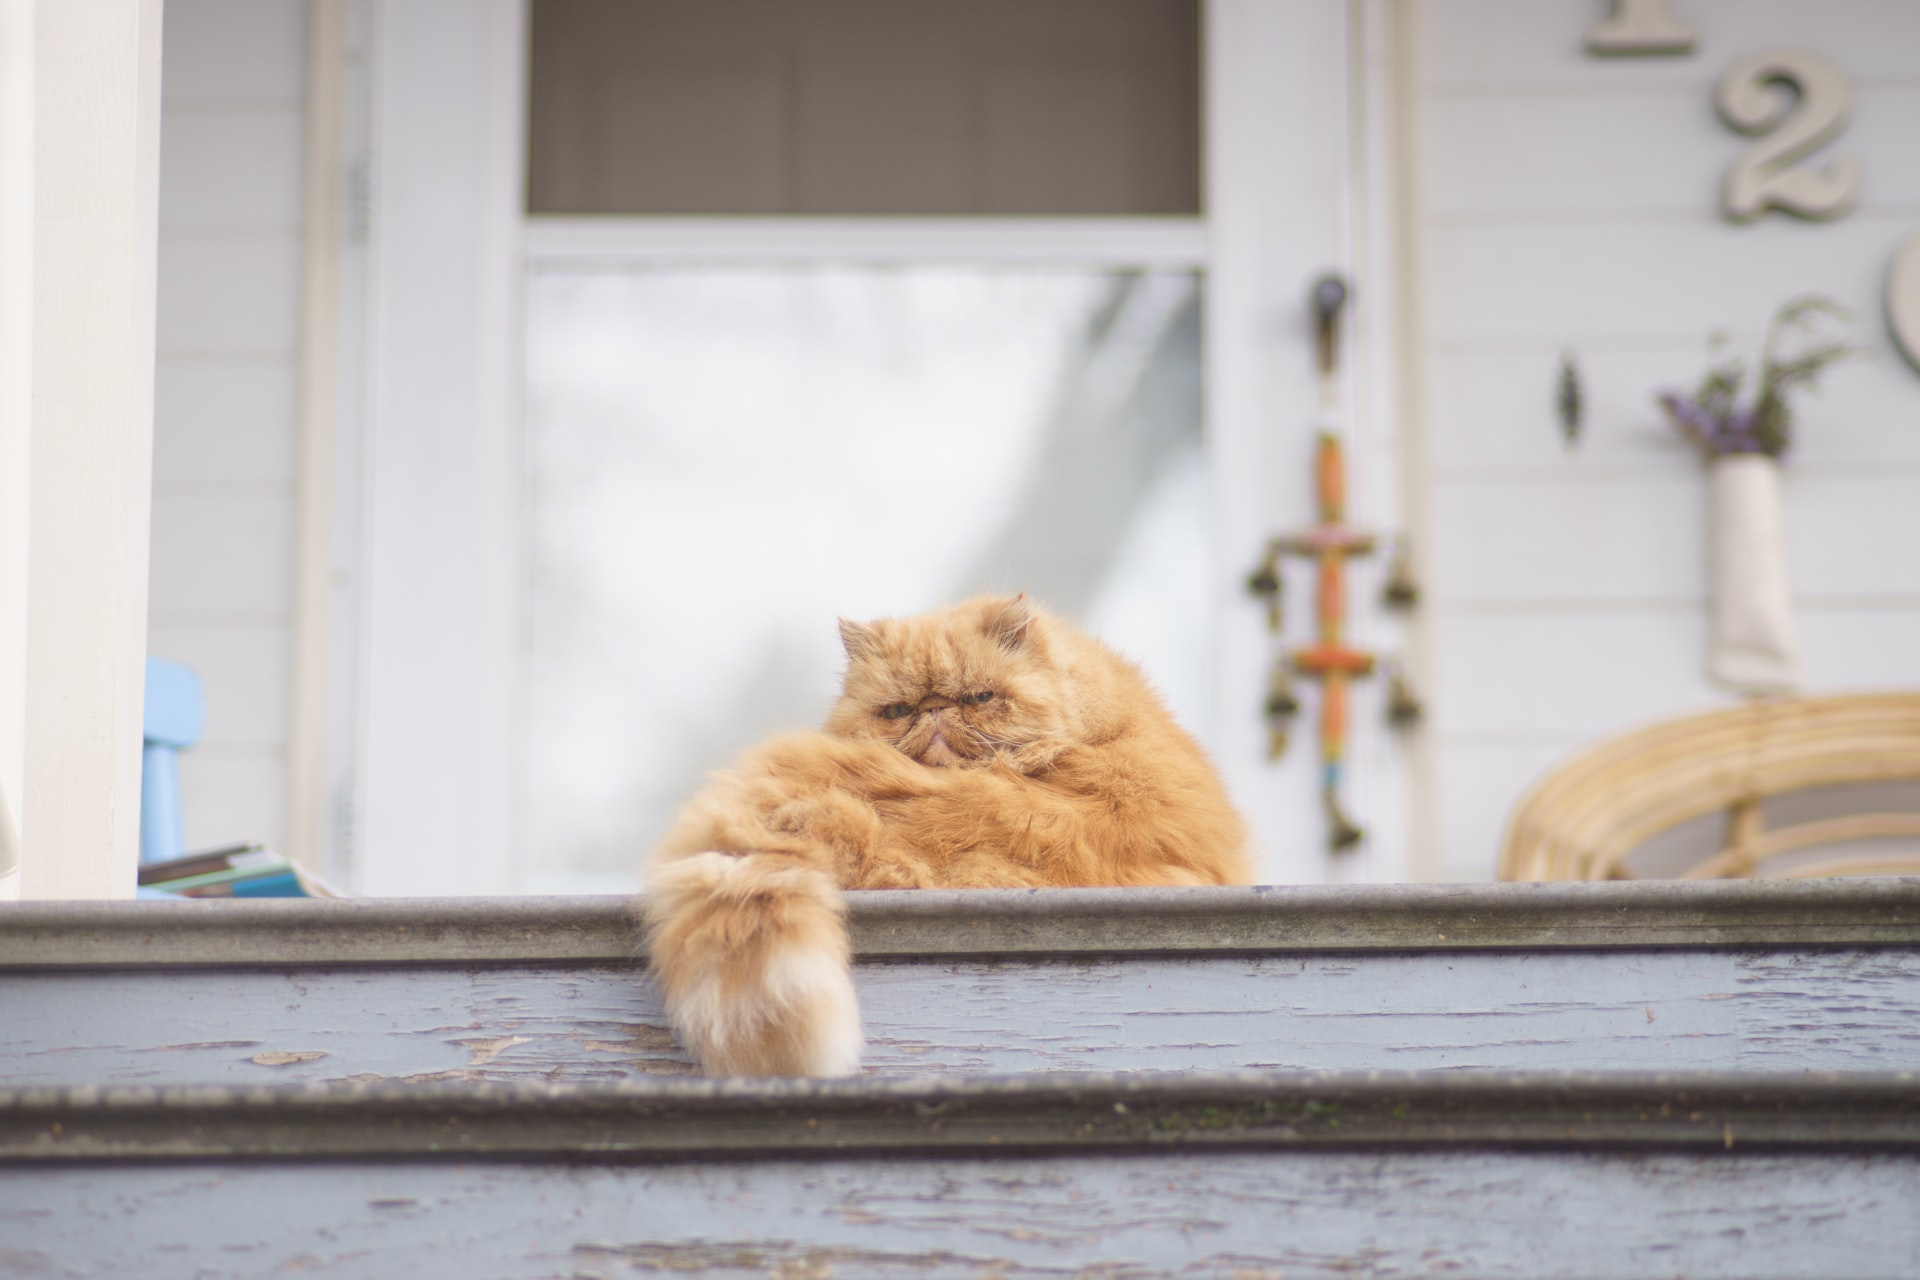 Descubra tudo sobre a raça de gato persa